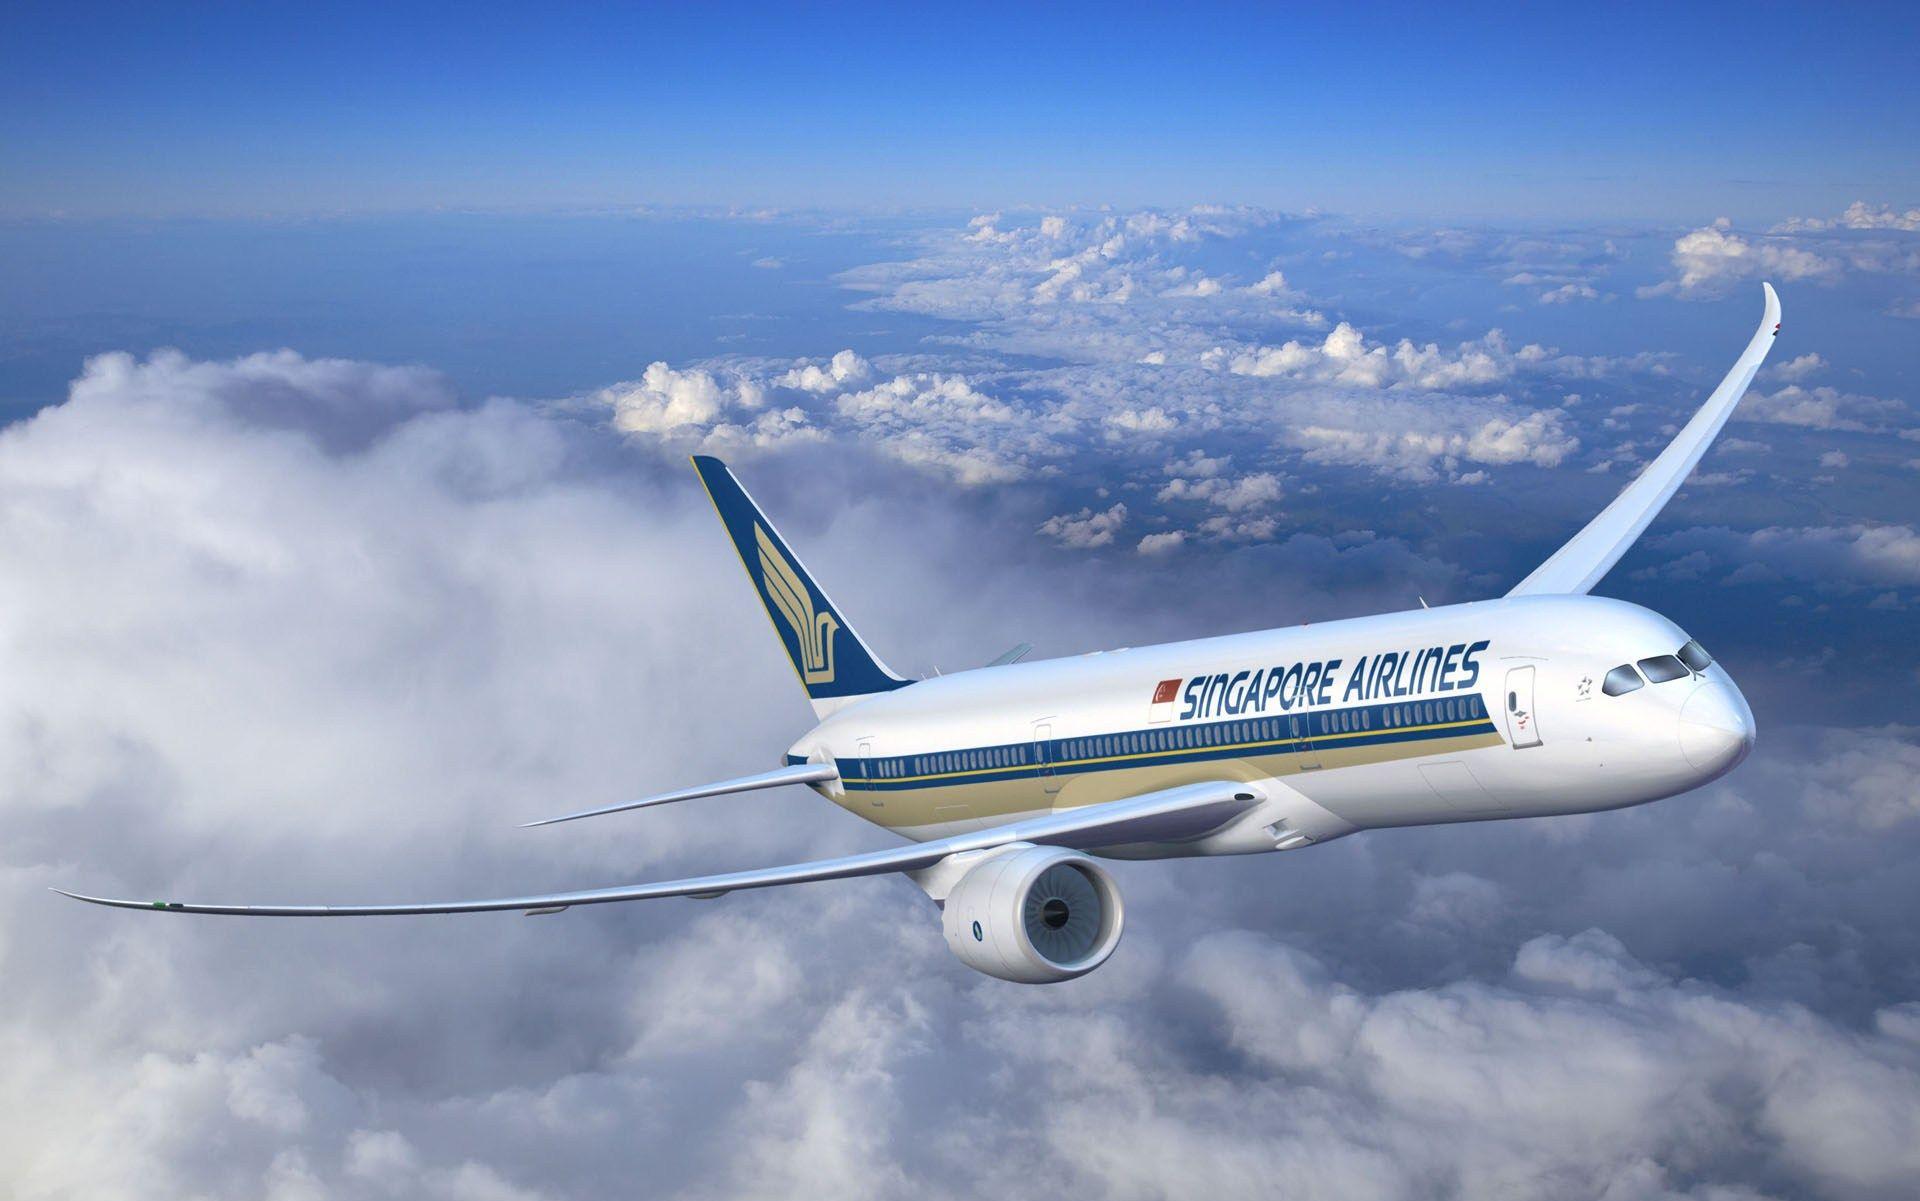 Trivandrum to Singapore flights